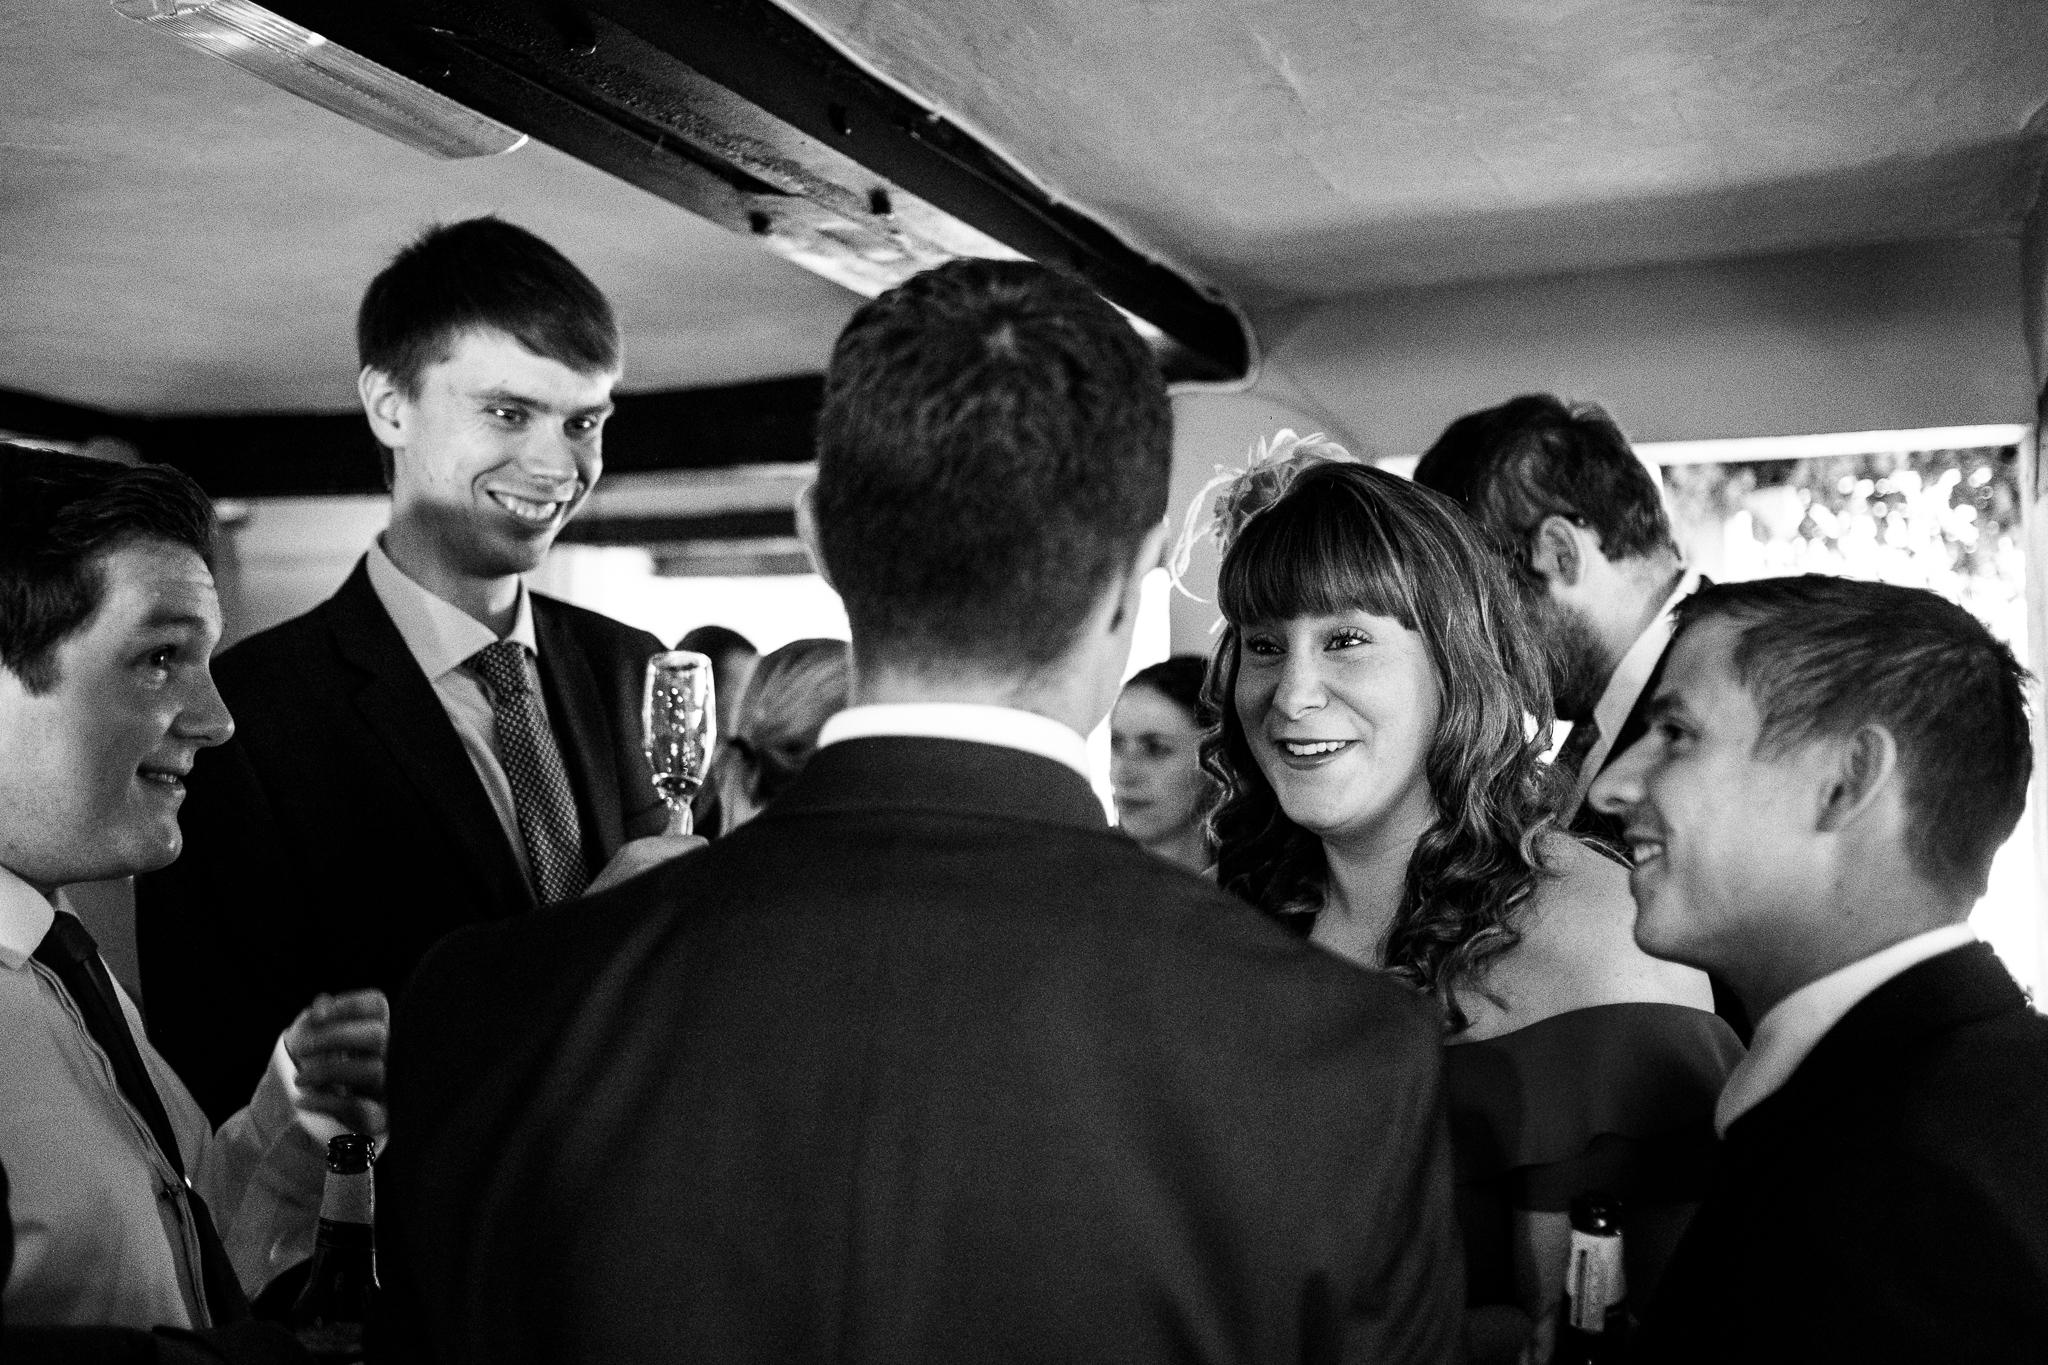 Relaxed Documentary Wedding Photography at The Wizard Inn, Alderley Edge Cheshire - Jenny Harper-56.jpg